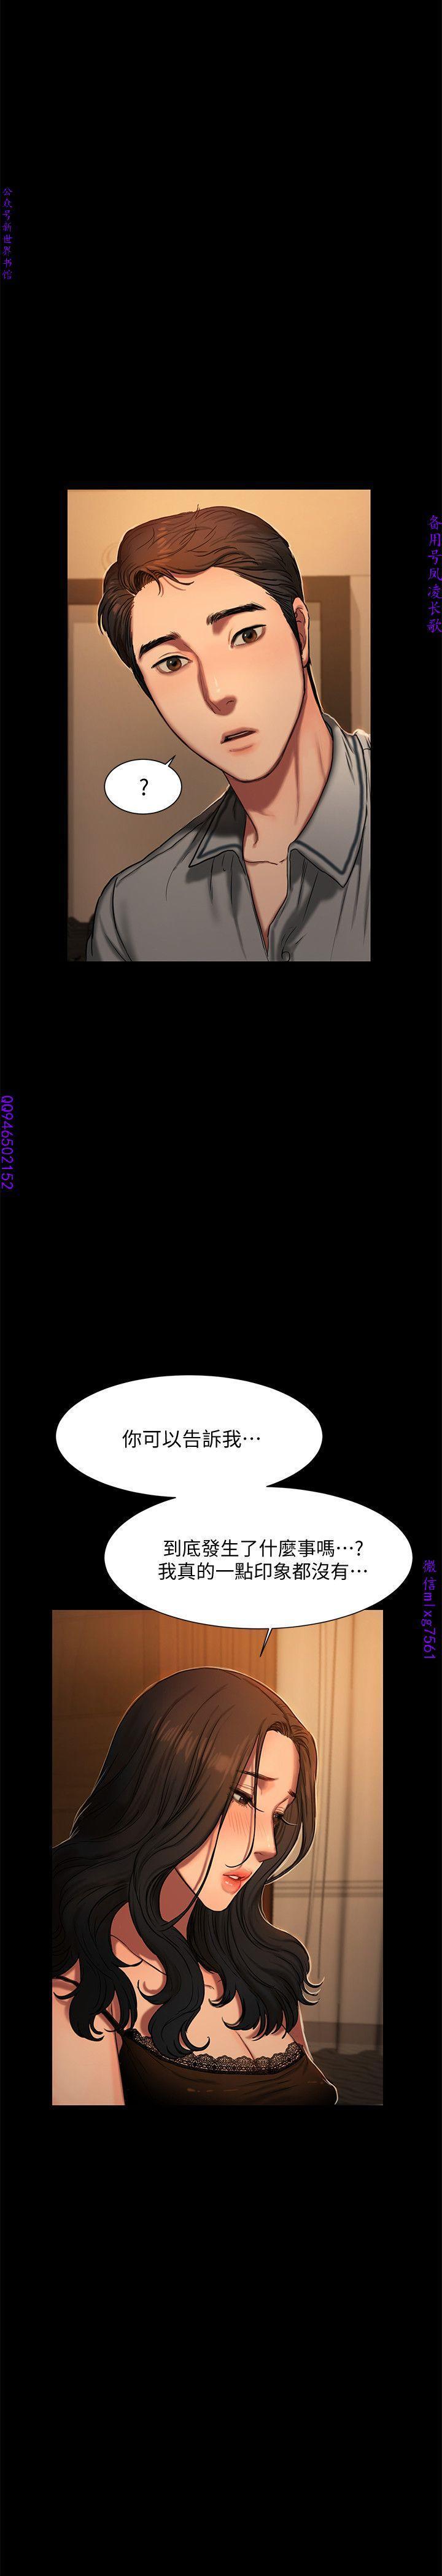 Run away 1-10【中文】 80